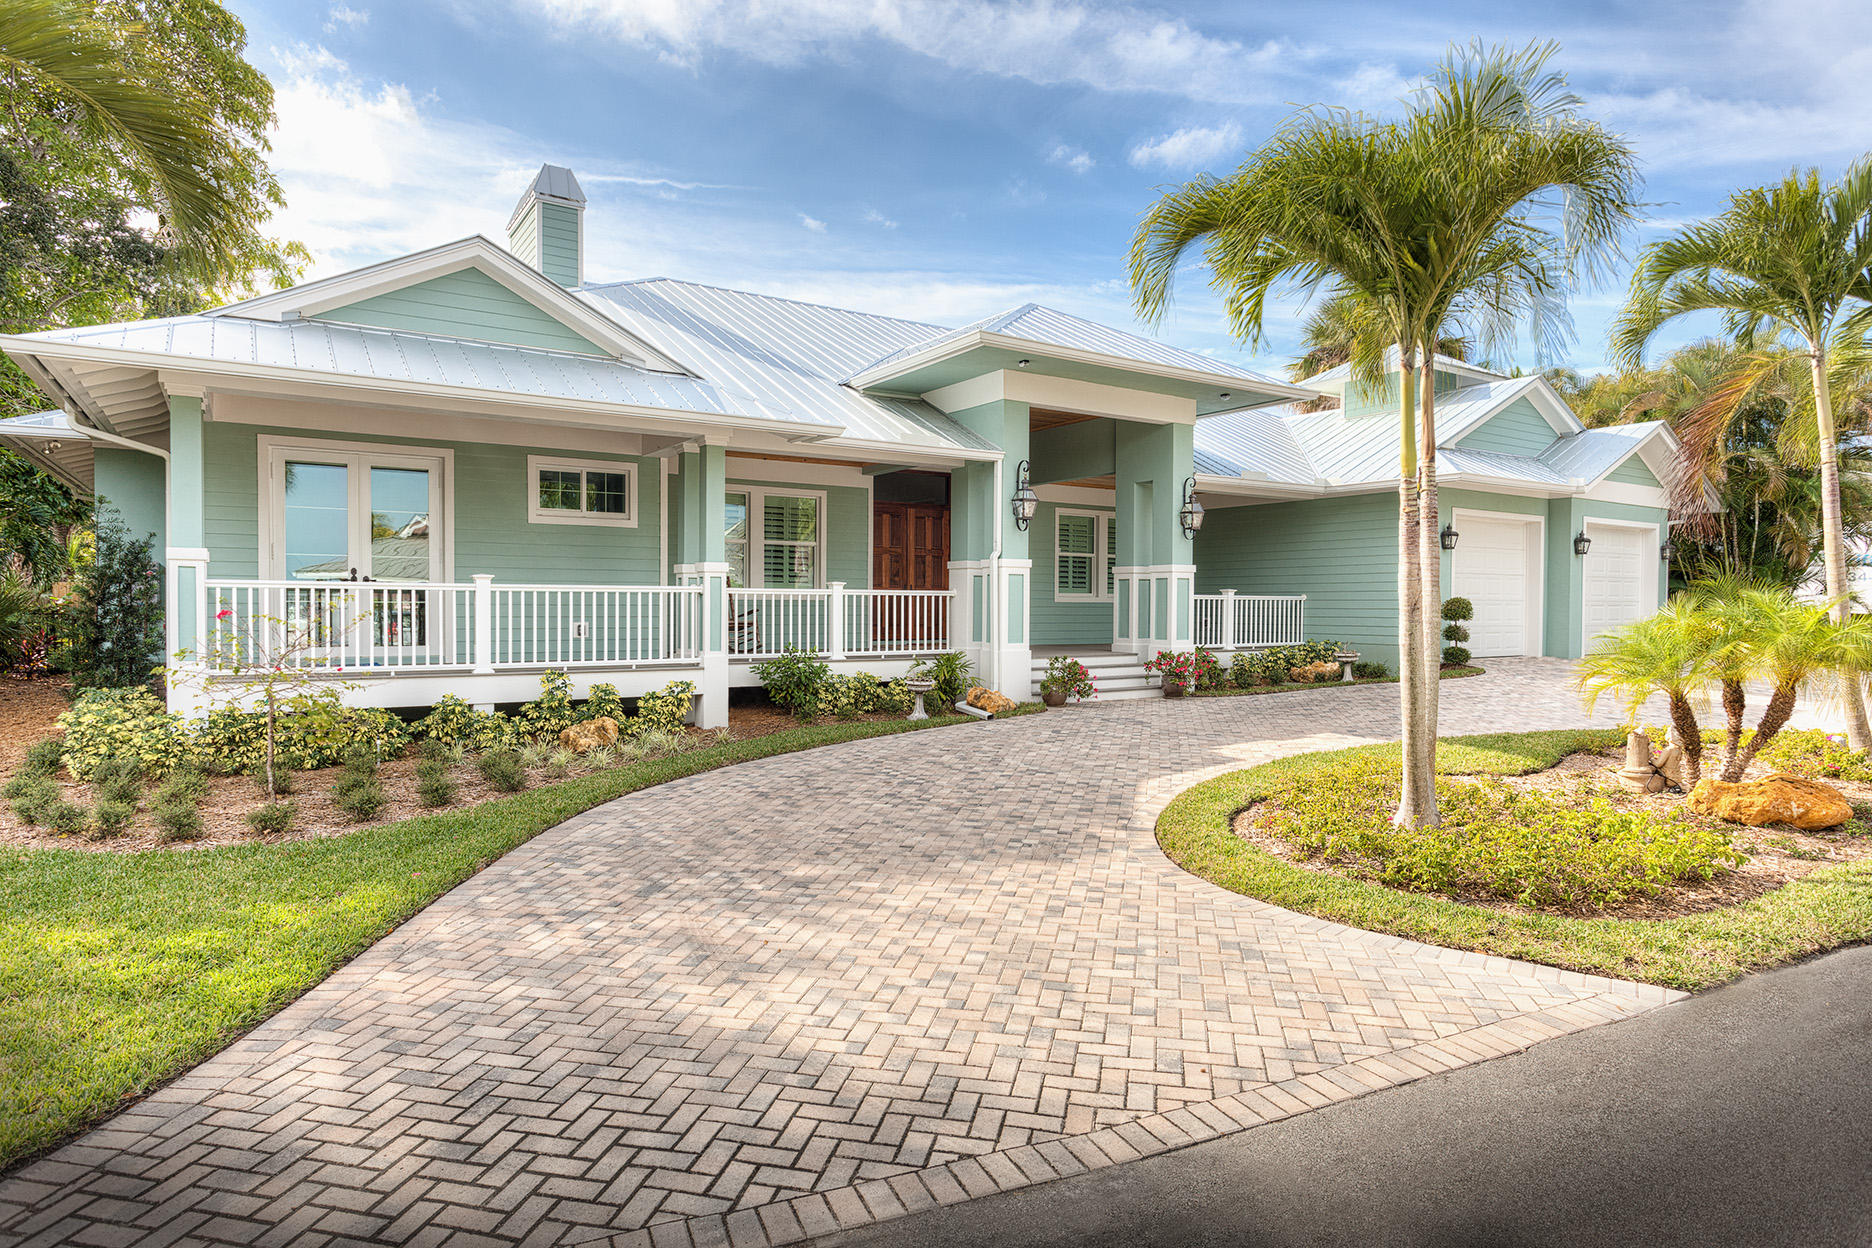 Photo of 1605 NW Bay Tree Circle, Stuart, FL 34994